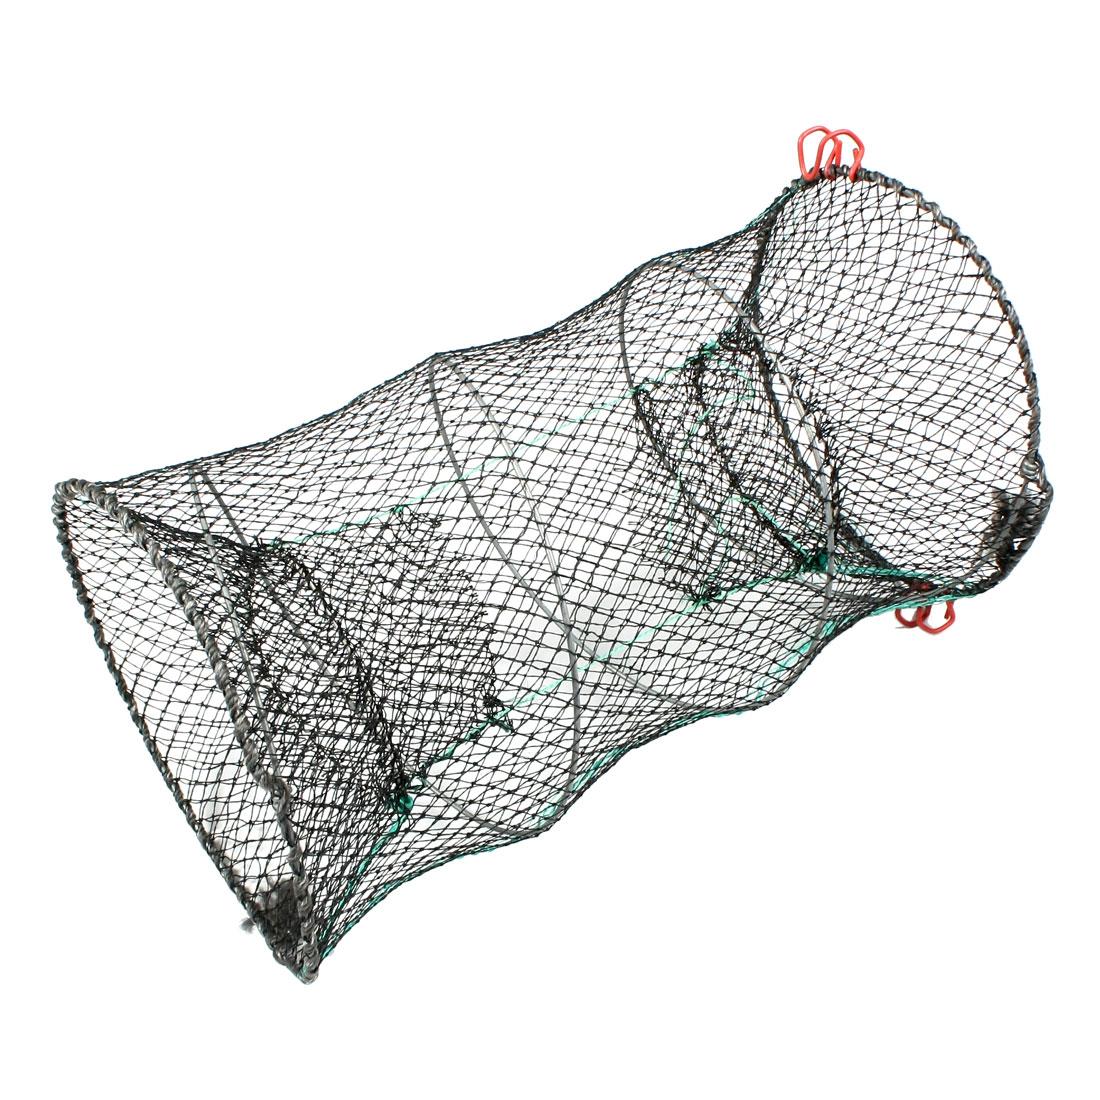 60cm x 29.5cm Black Mesh Cylinder Dual Entrance Fish Shrimp Crab Net